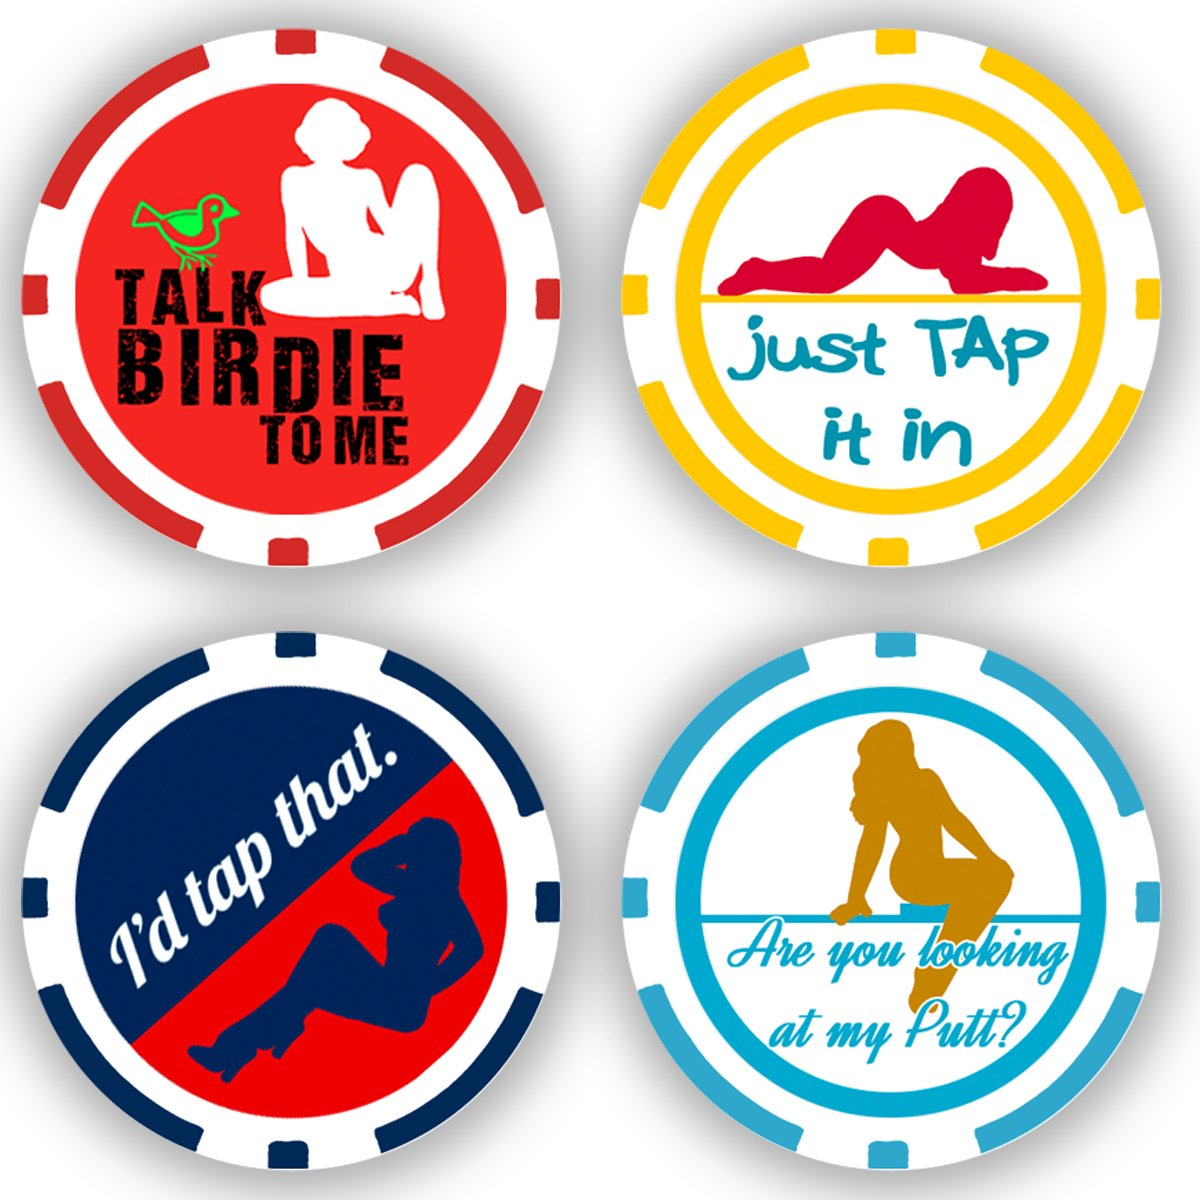 DA VINCI Golf Ball Marker Poker Chip Collection, 11.5 Gram Chips